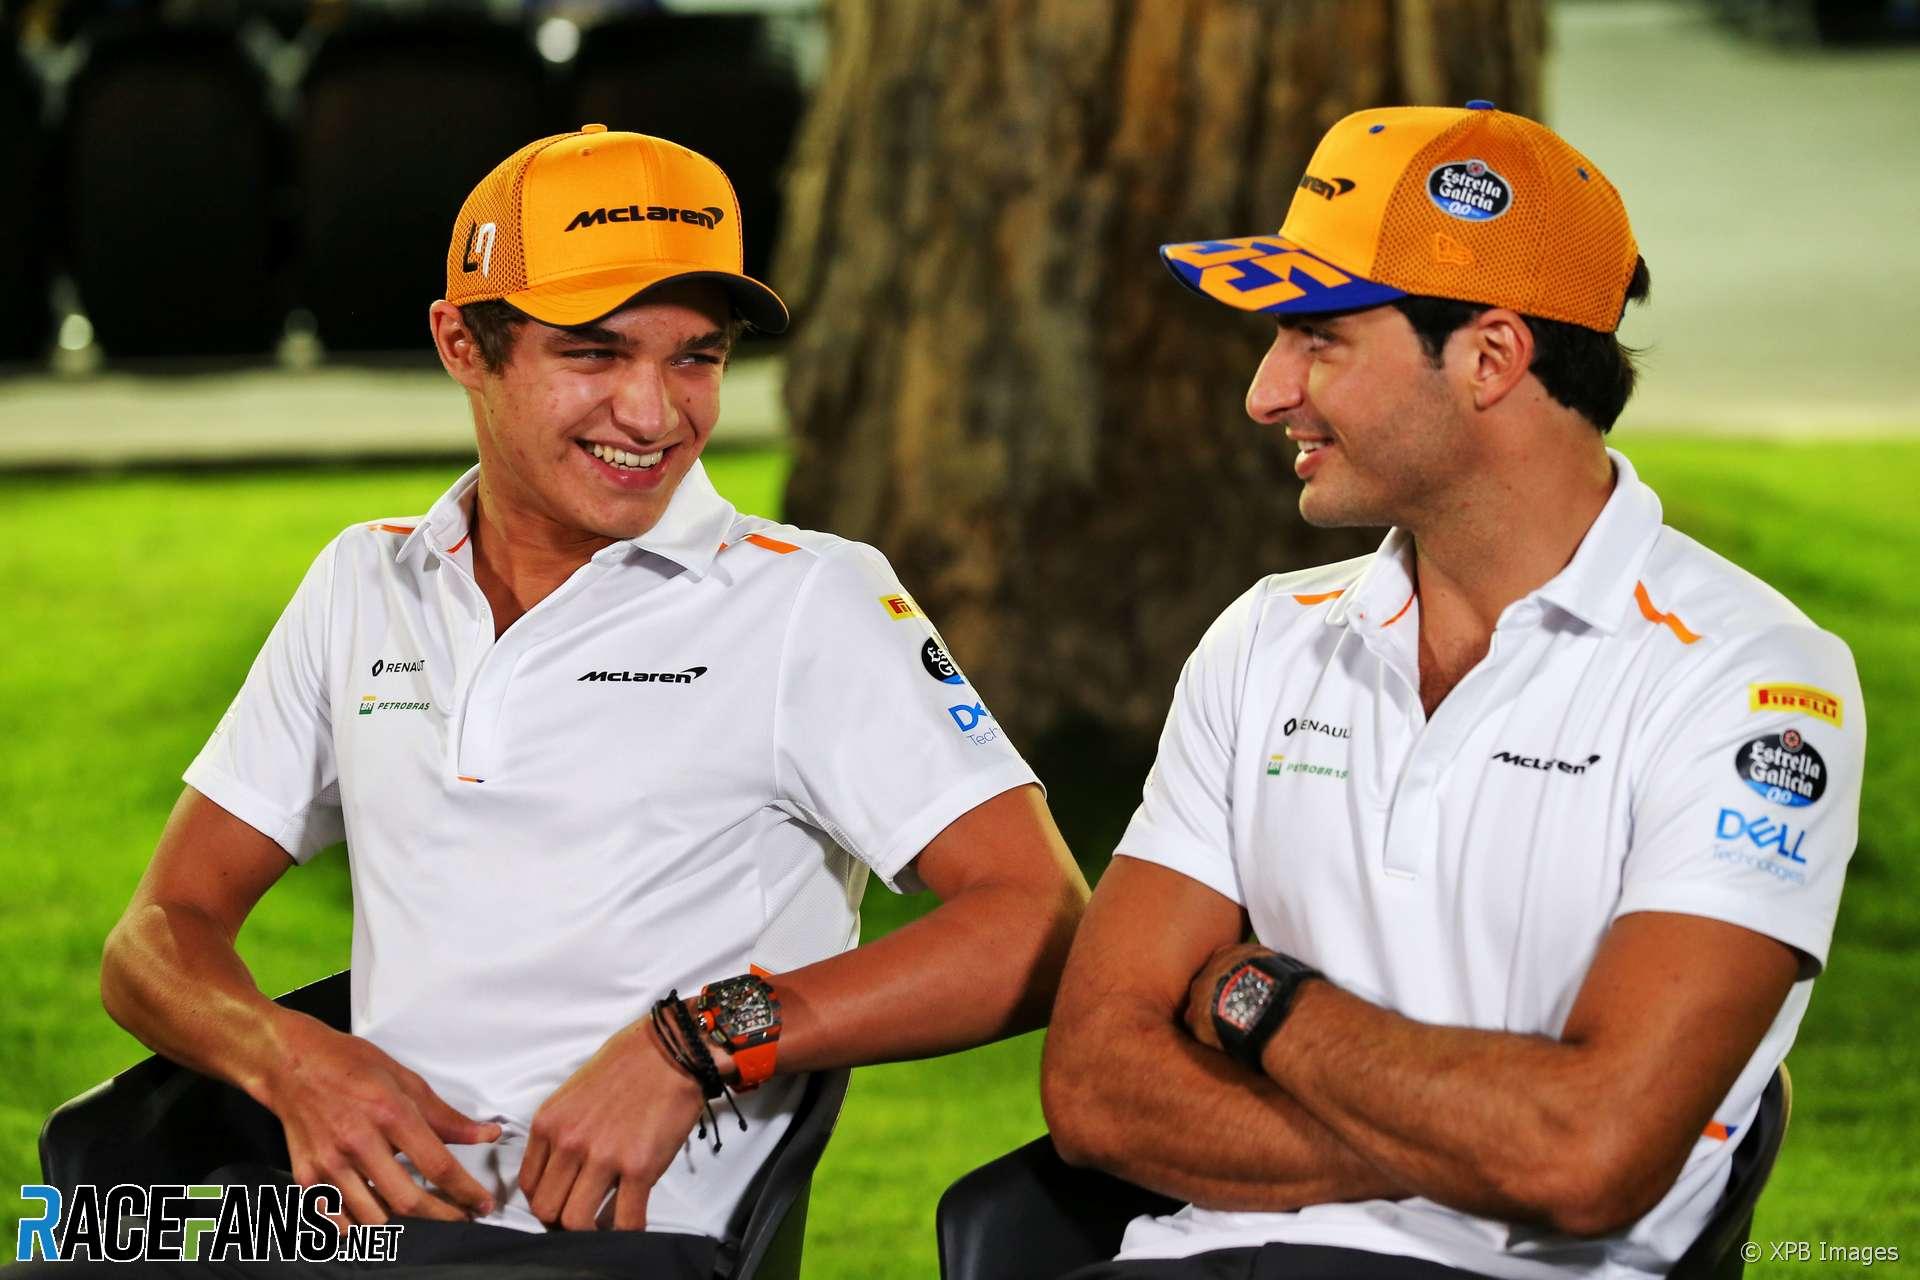 Carlos Sainz Jnr, Landio Norris, McLaren, 2019